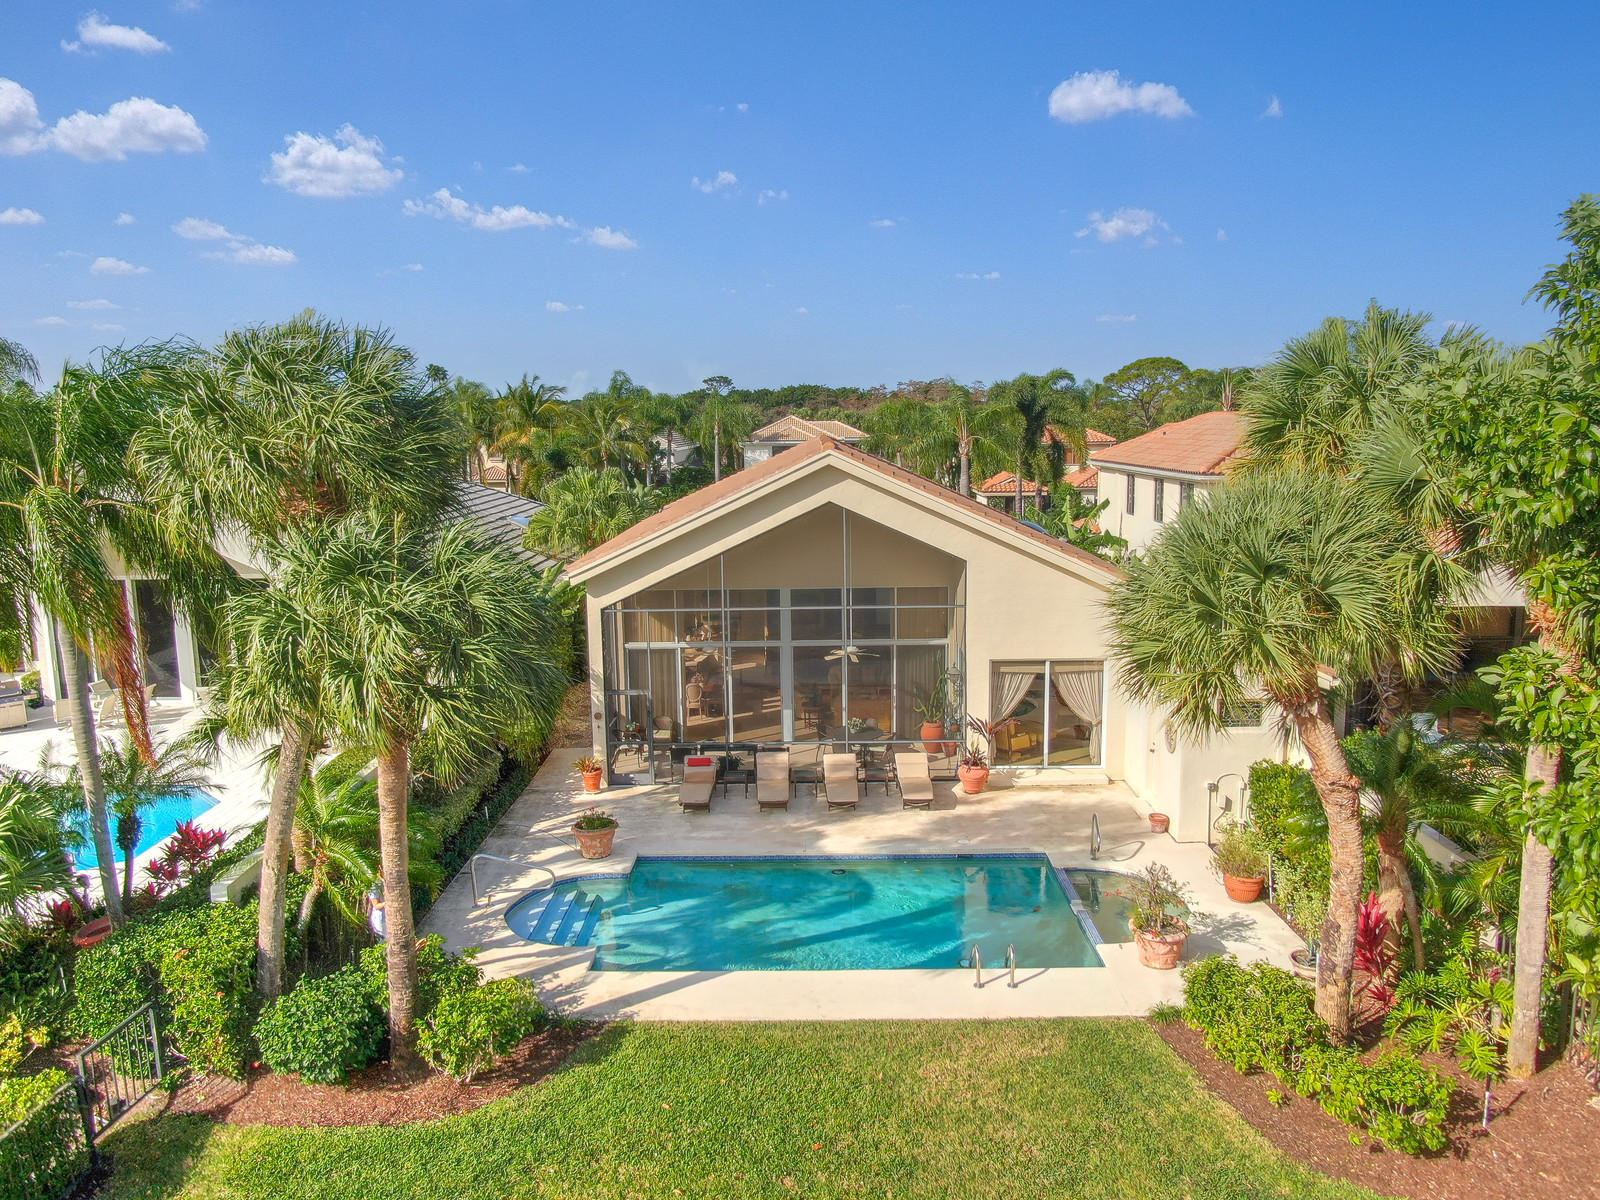 Photo of 13368 Provence Drive, Palm Beach Gardens, FL 33410 (MLS # RX-10592858)